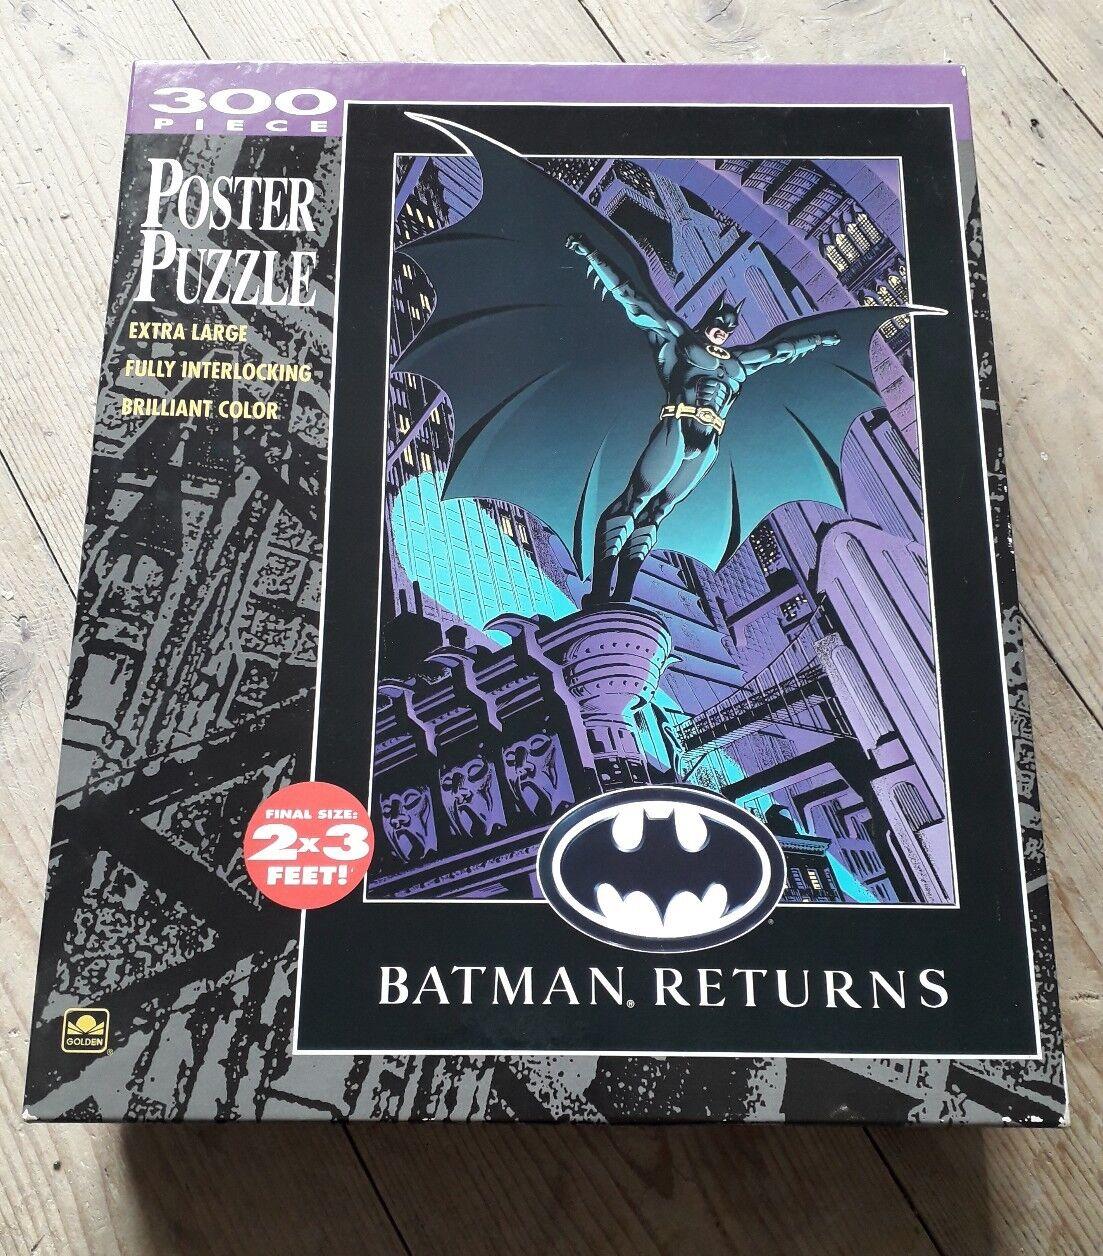 RARE 'BATMAN RETURNS  1992 Movie Poster Jigsaw Puzzle Size 2x3ft Unopened 300pc